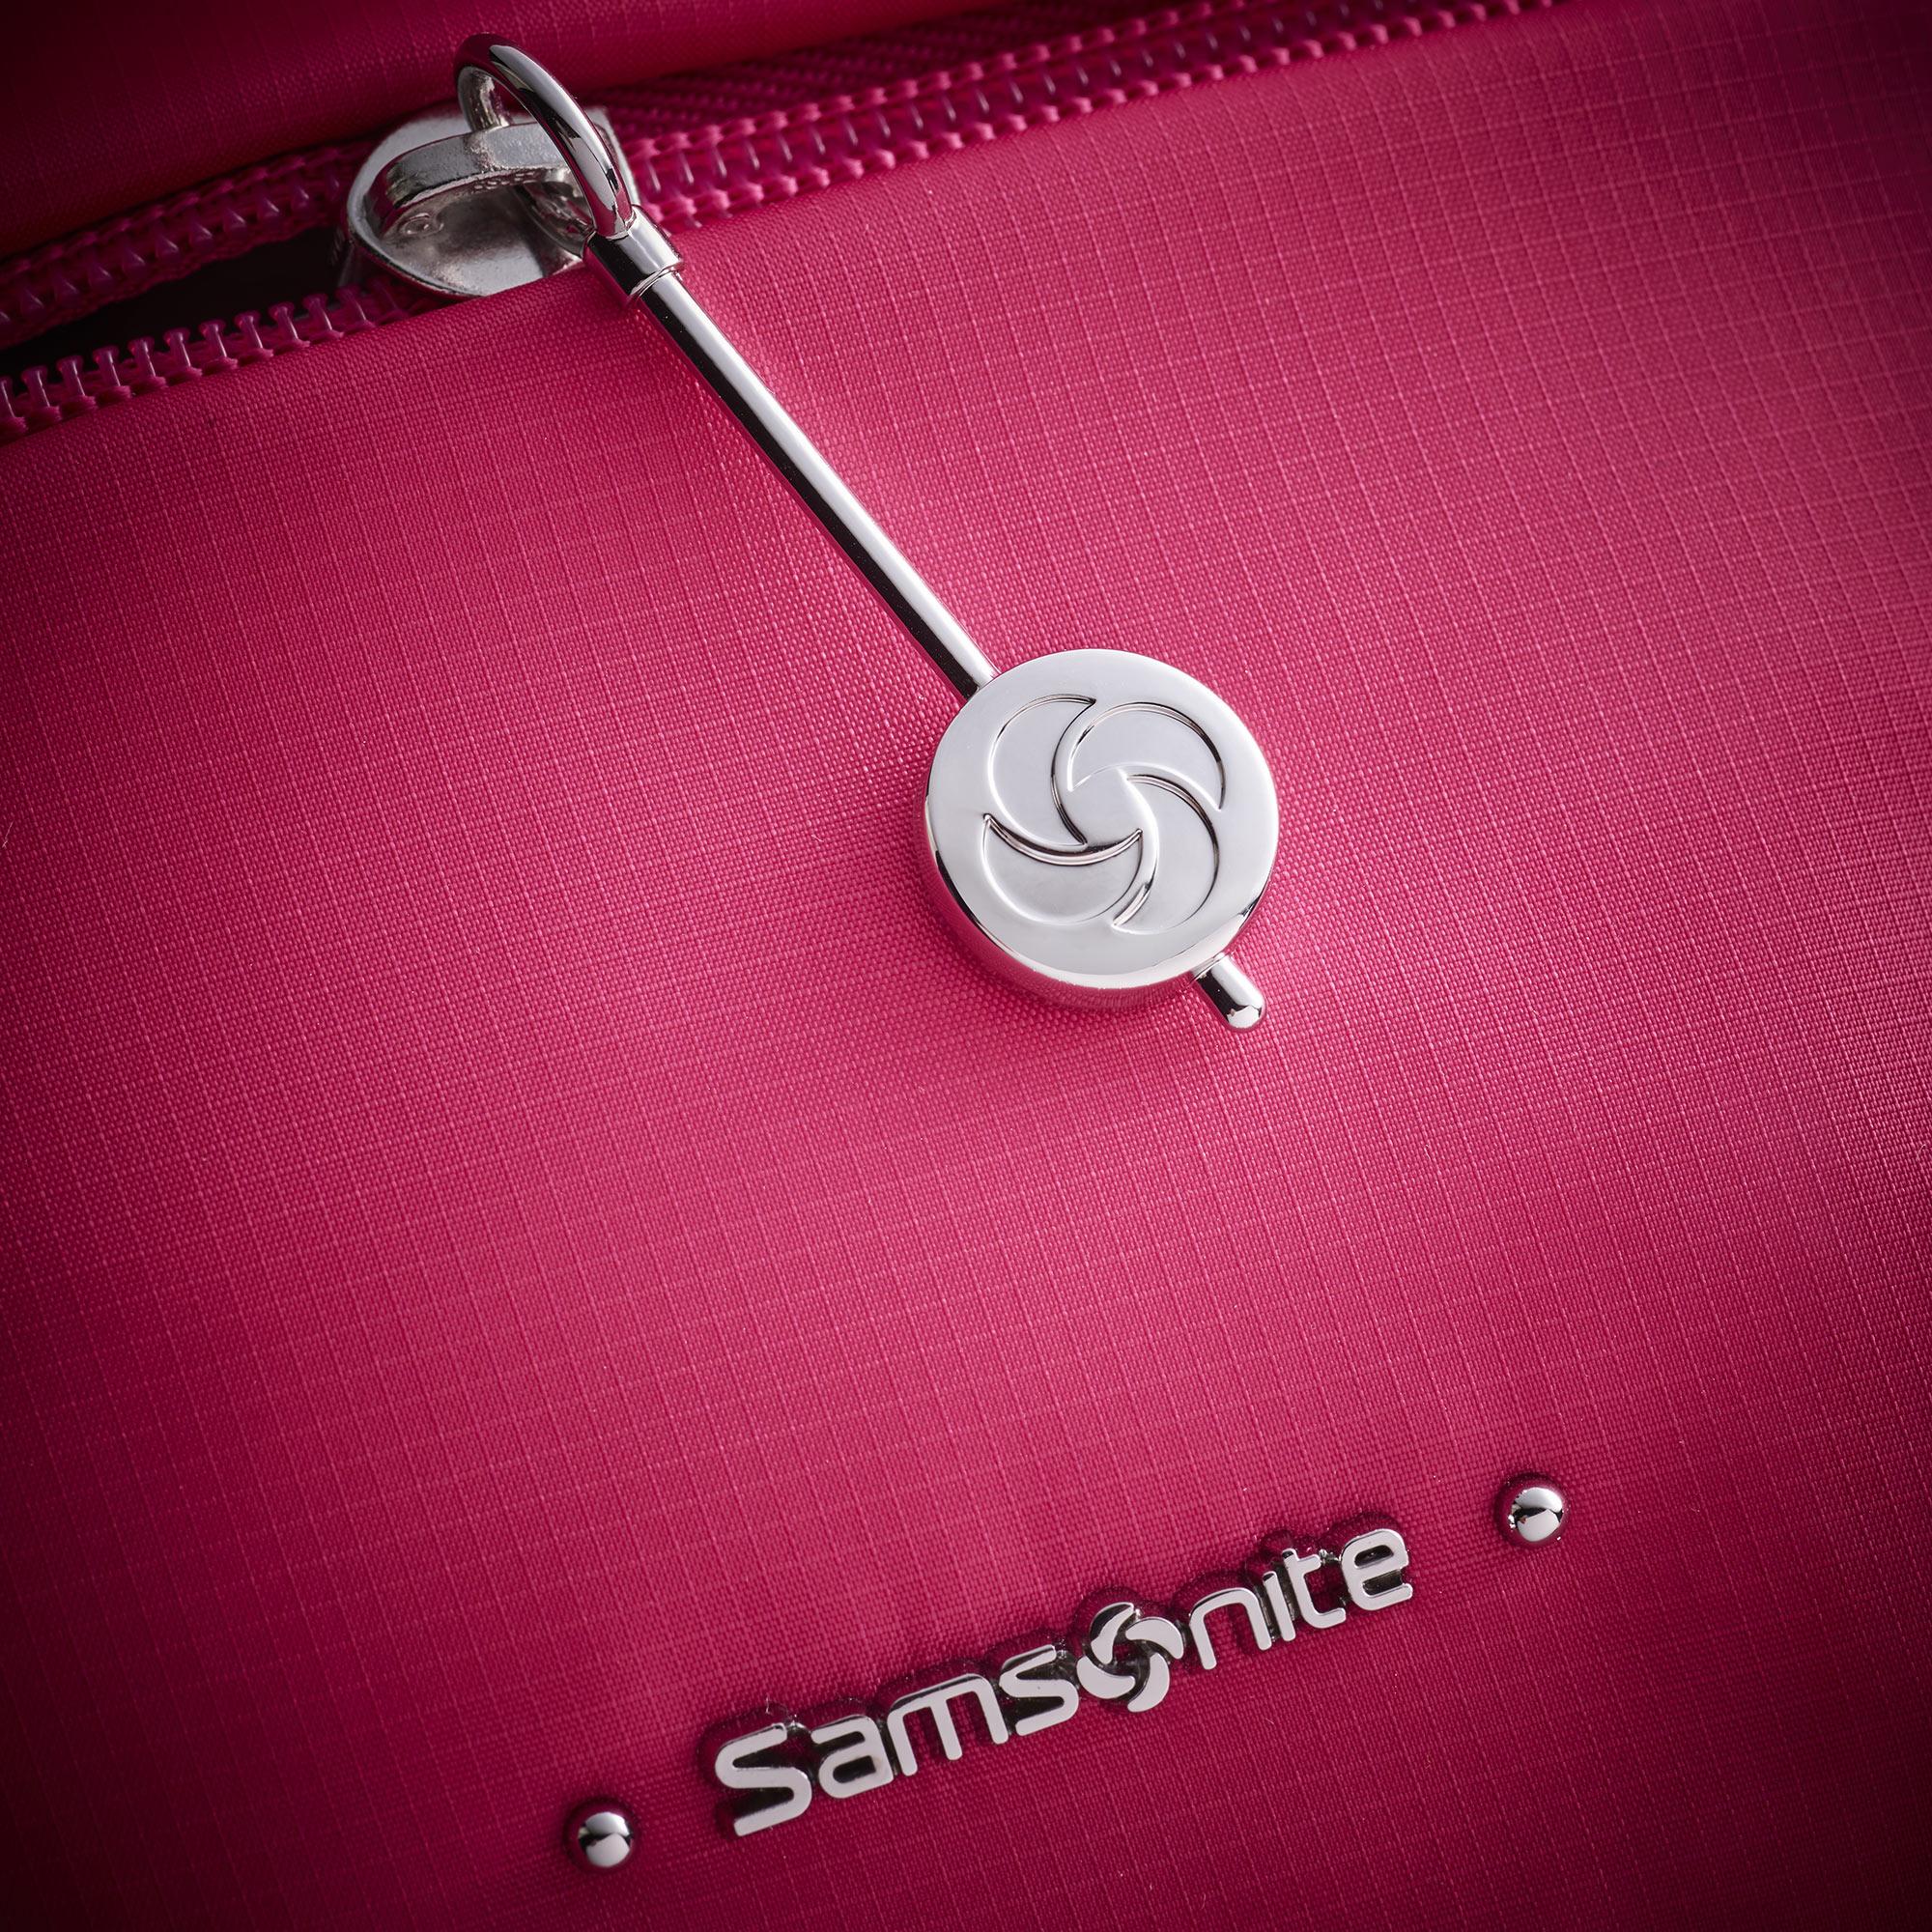 Red Bag Still Life Shot for Samsonite by Fotografando